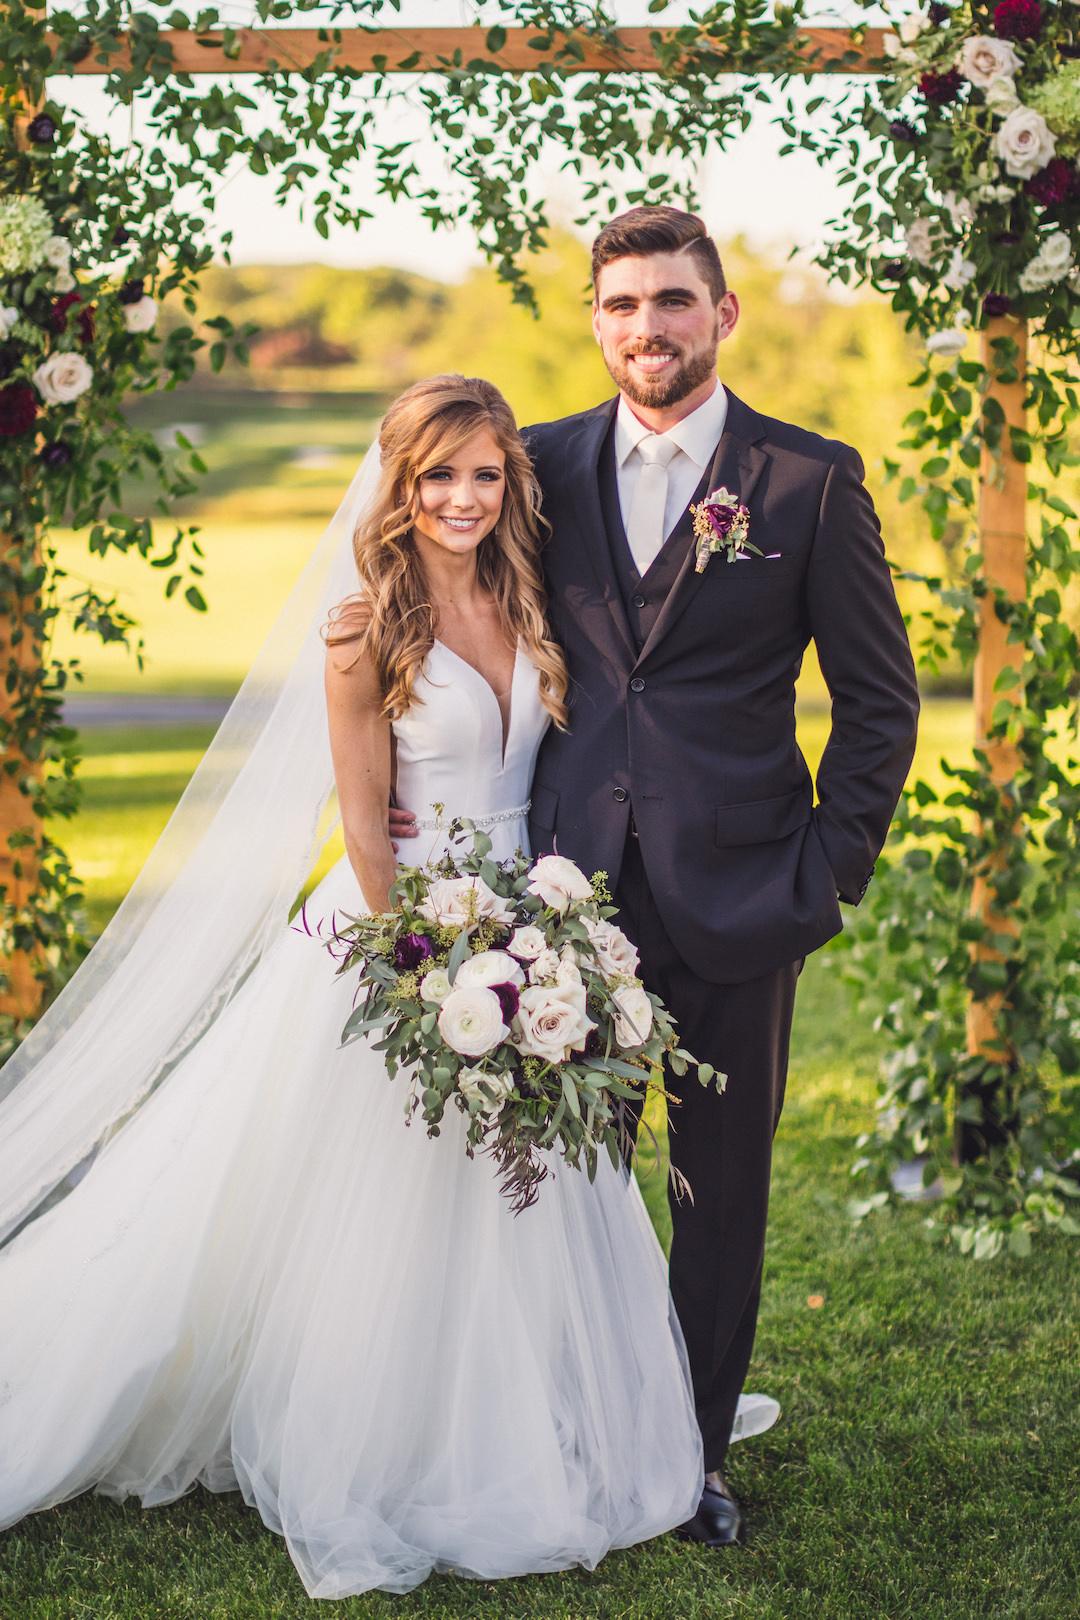 Wedding portrait: Elegant country club wedding captured by Henington Photography. See more elegant wedding ideas at CHItheeWED.com!